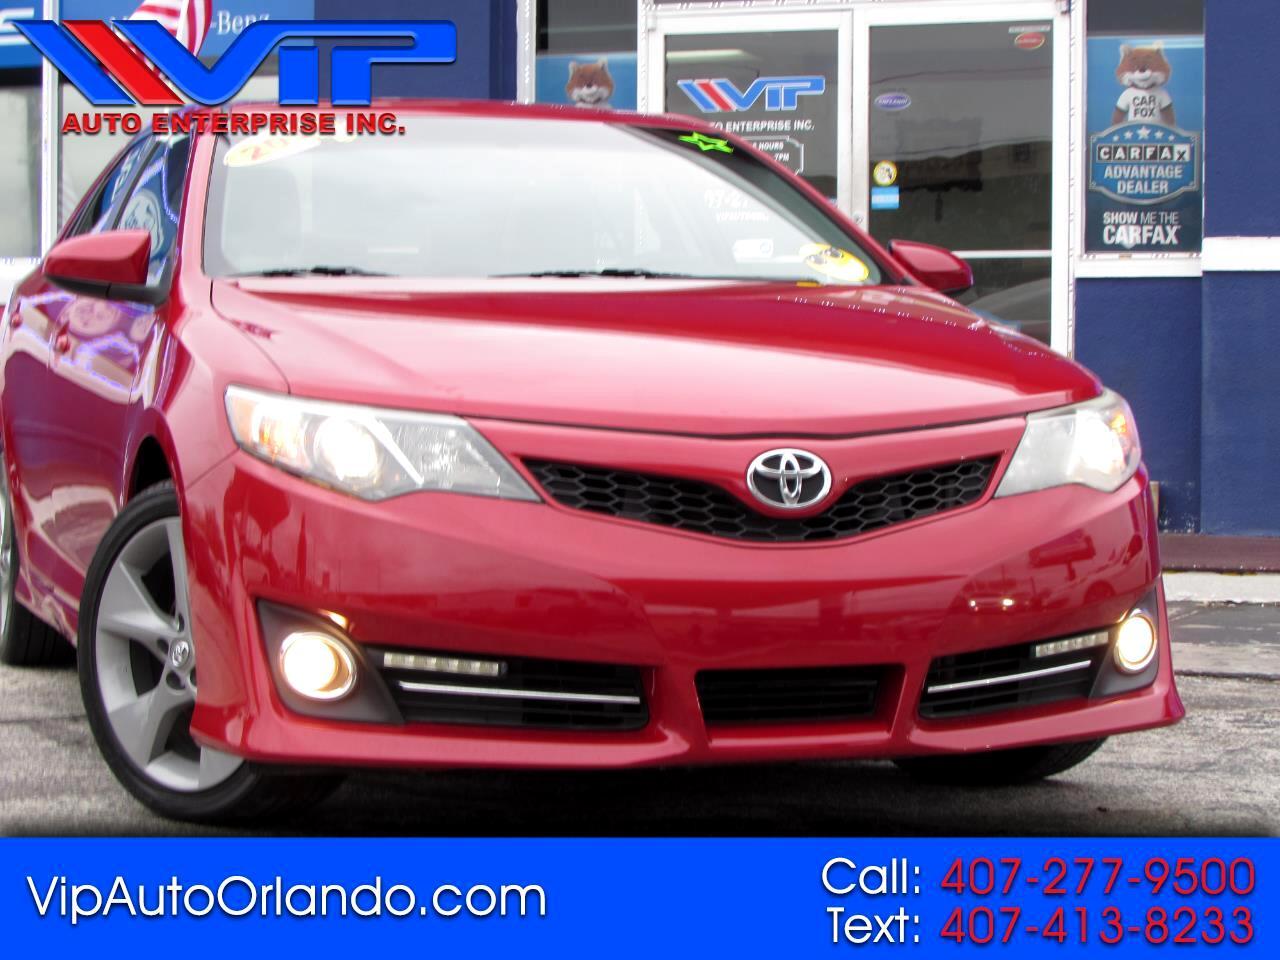 Toyota Camry 2014.5 4dr Sdn V6 Auto SE (Natl) 2014